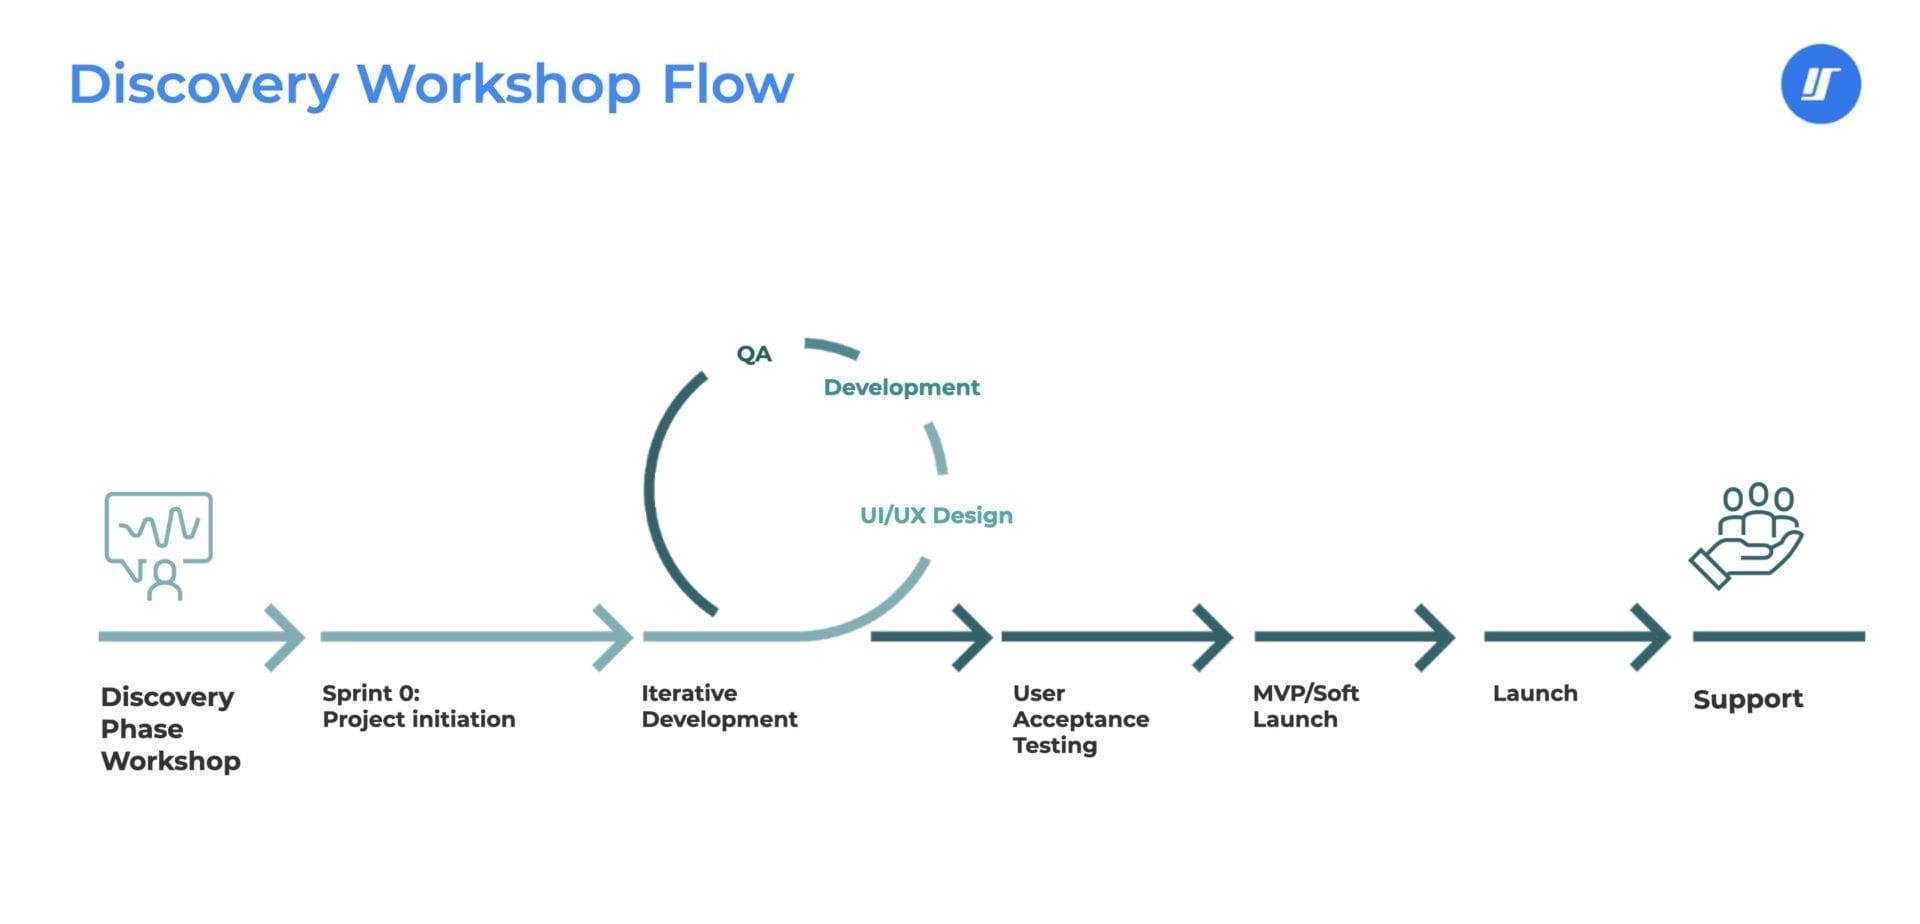 retail webinar discovery workshop